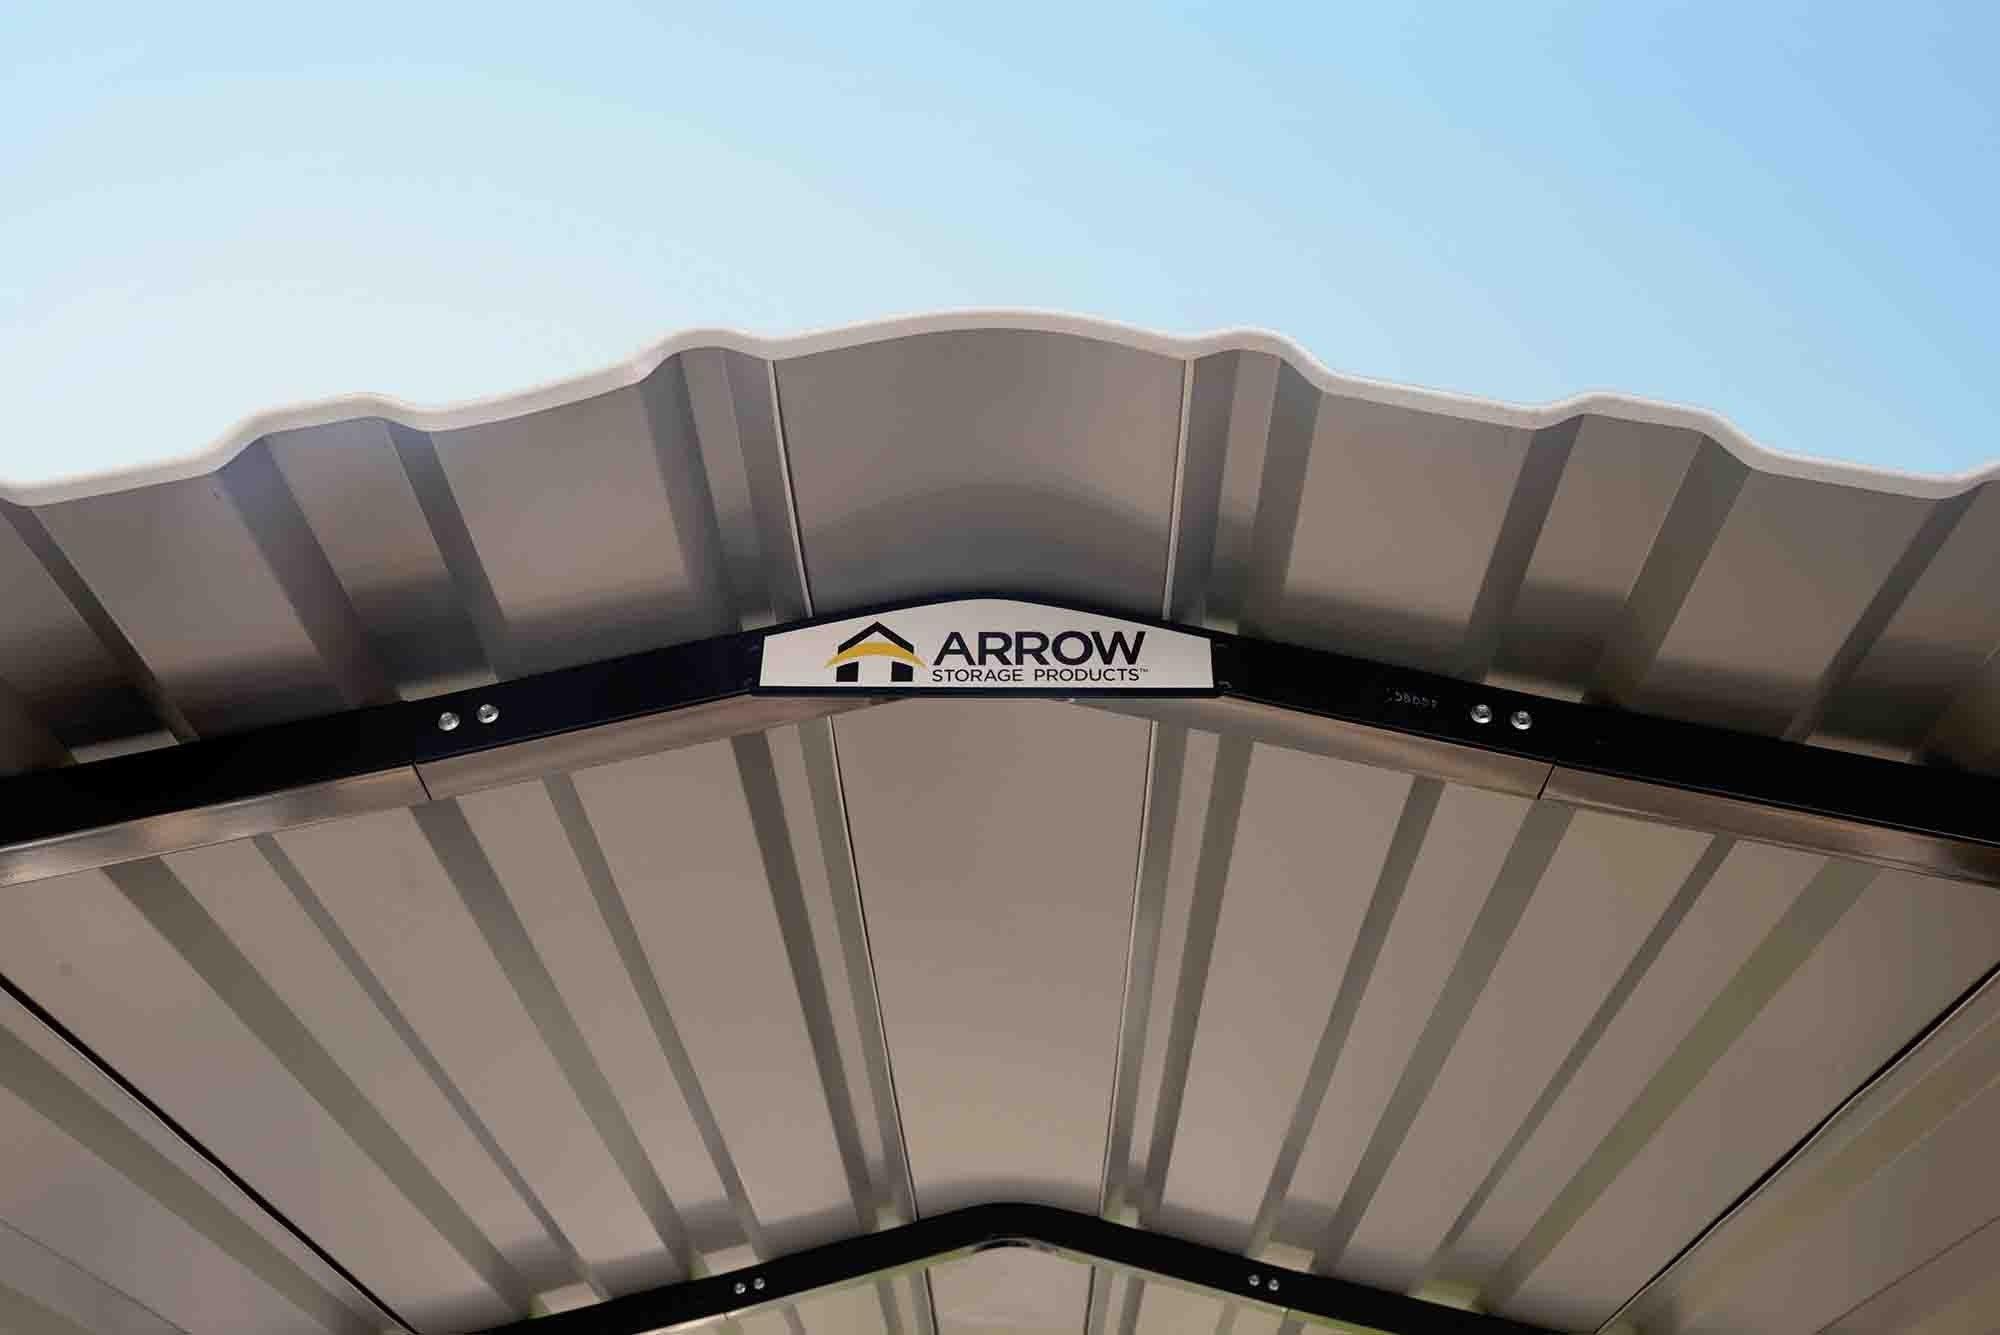 Arrow Arrow Carport 10x15x7, 29 Gauge Galvanized Steel